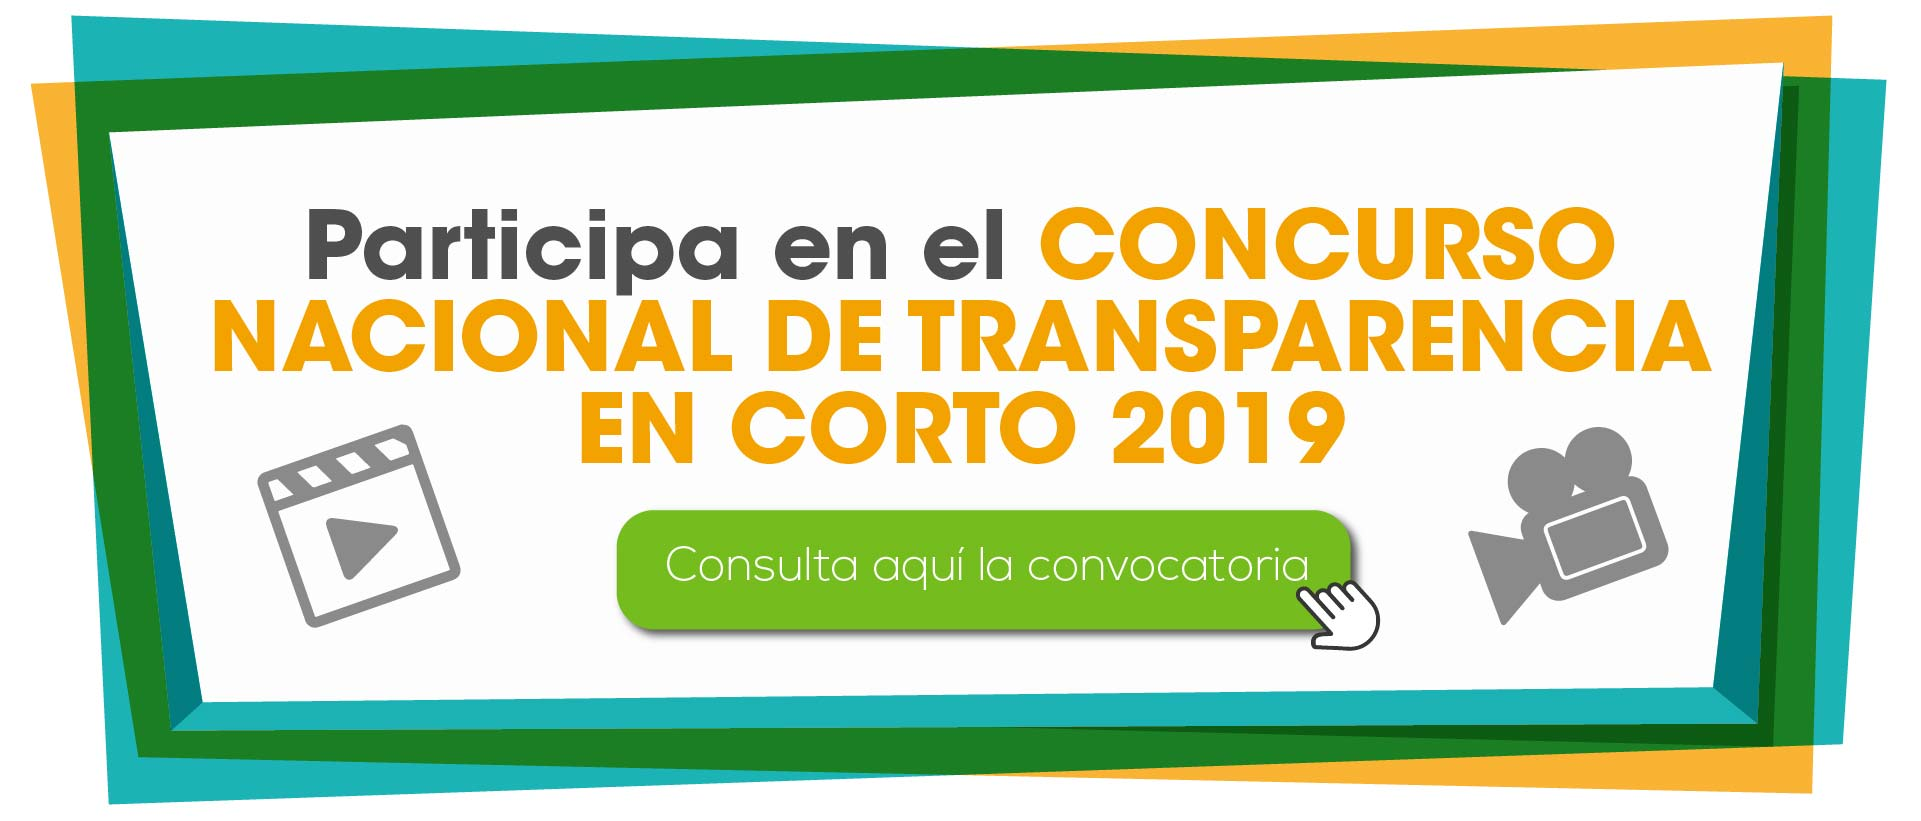 Concurso Nacional de Transparencia 2019